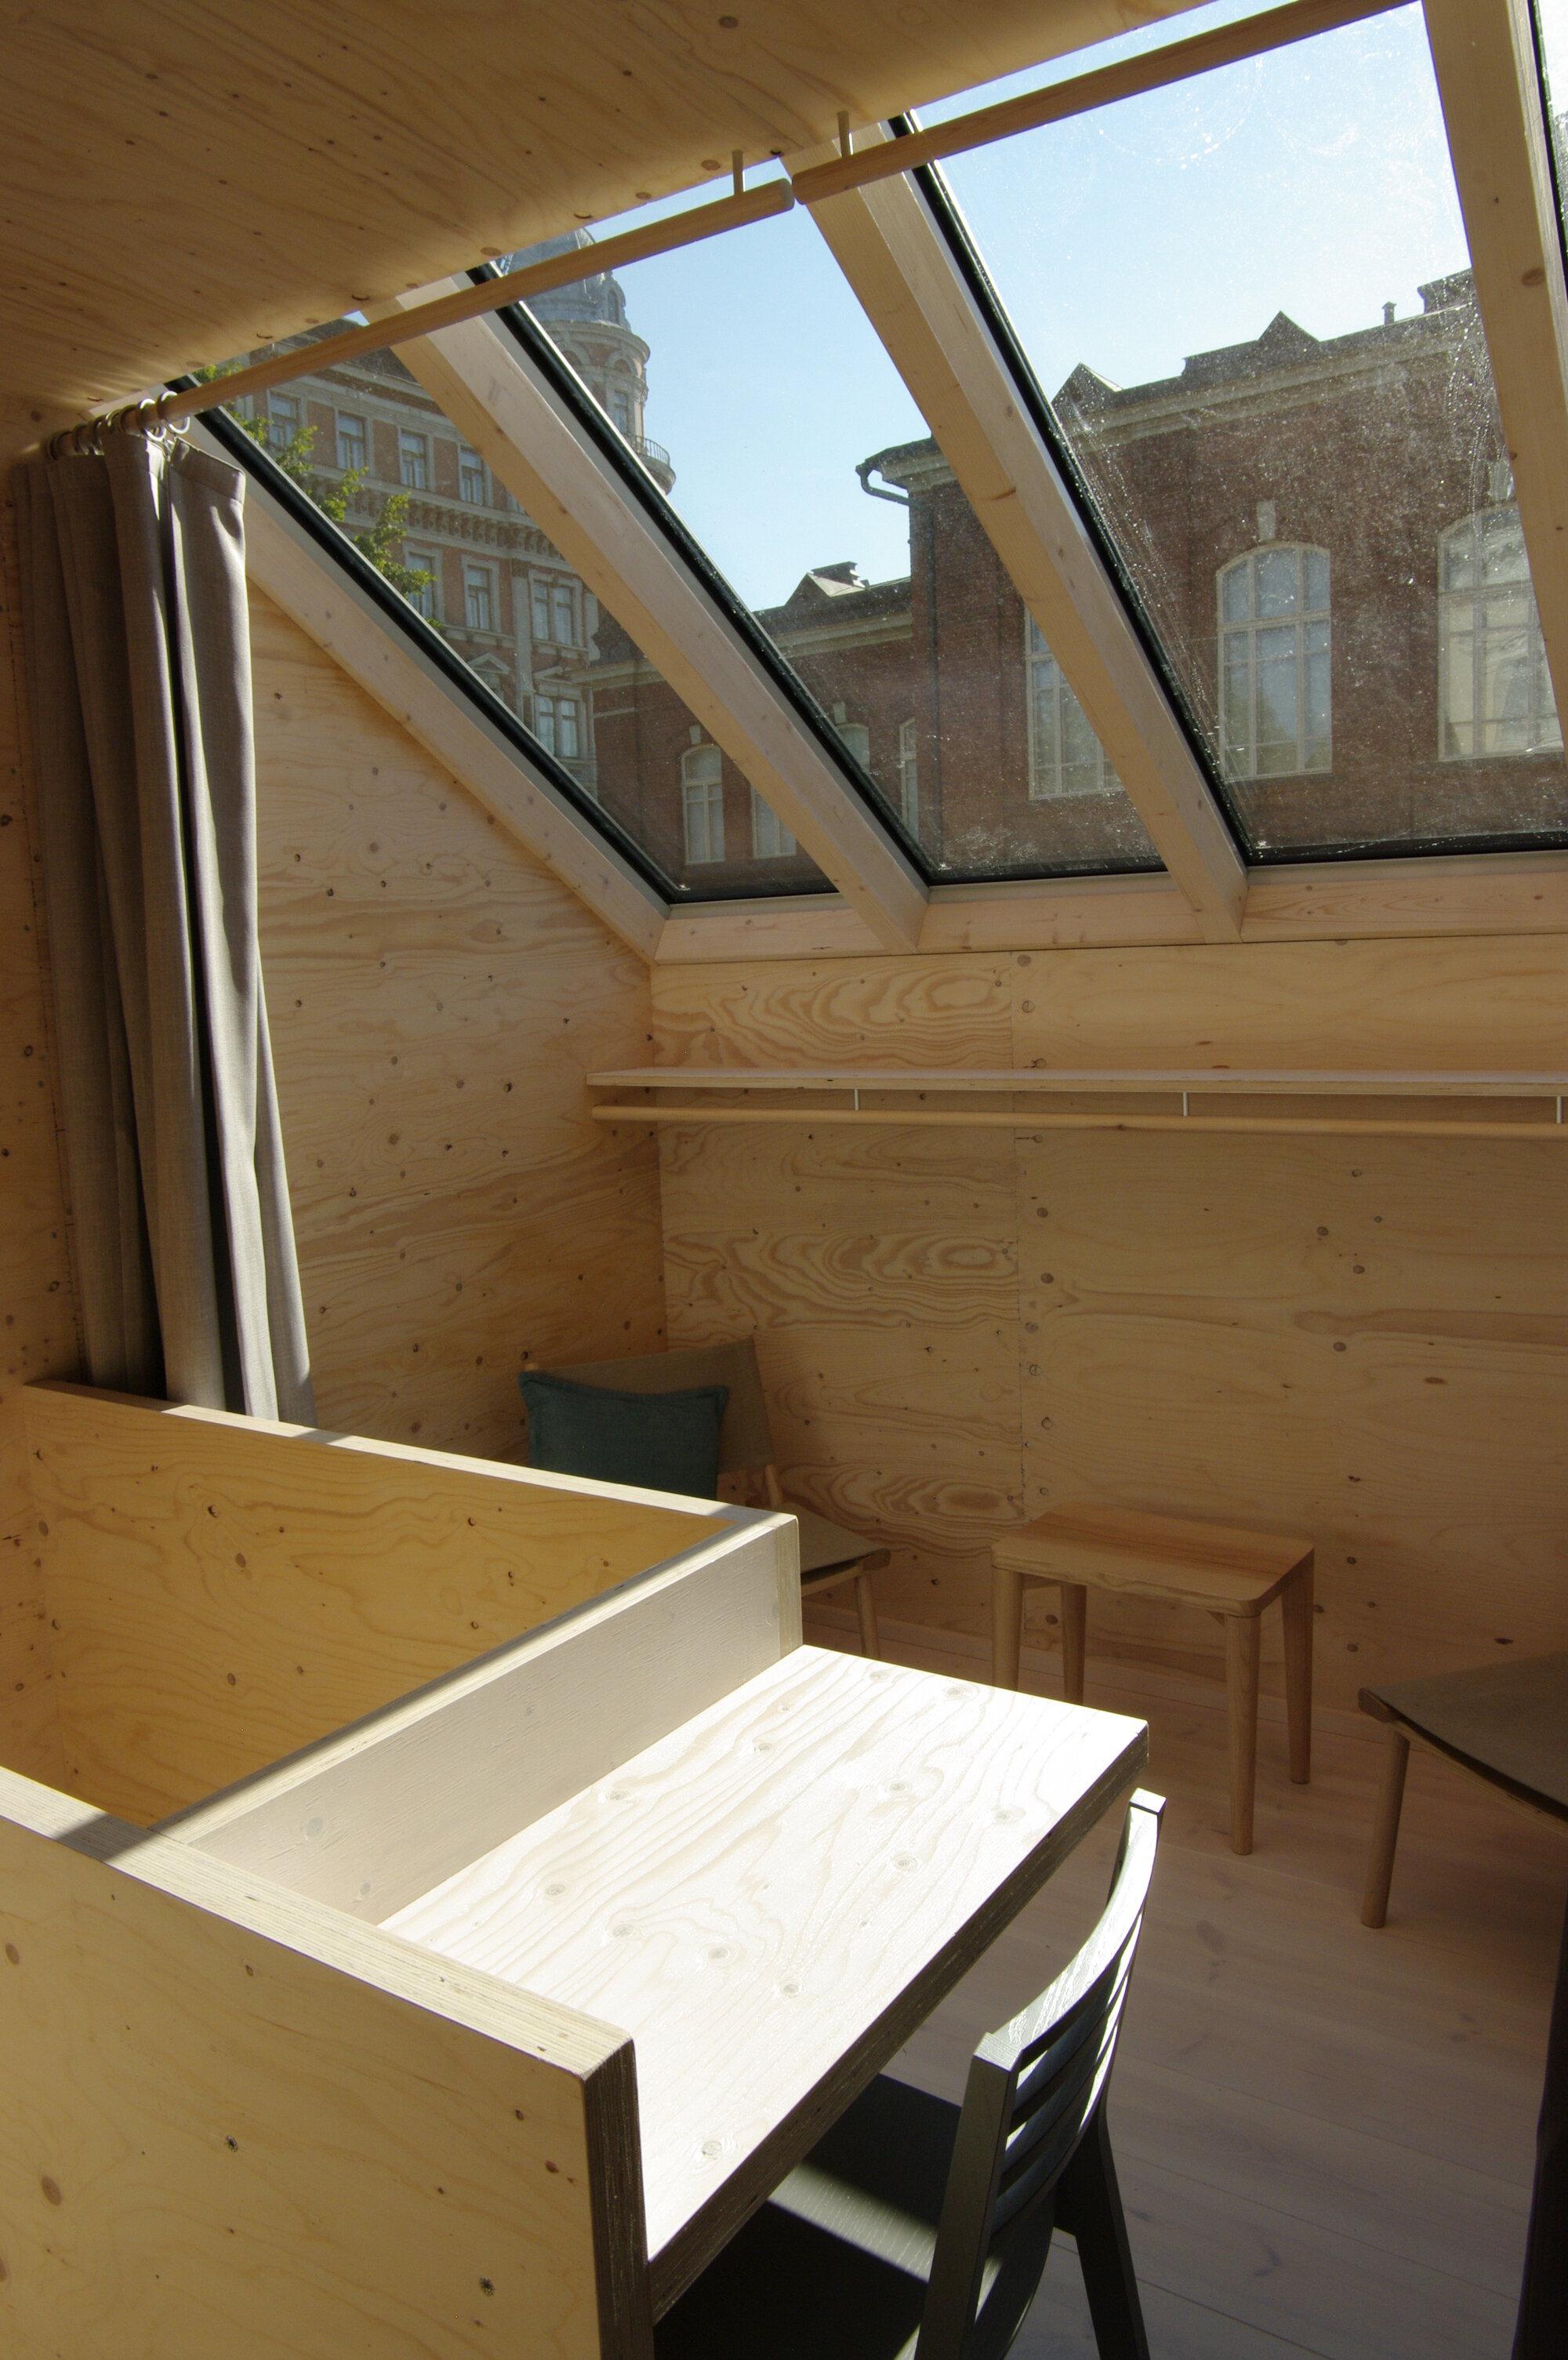 Kokoon - Aalto University Wood Program - Finland - Study Desk - Humble Homes